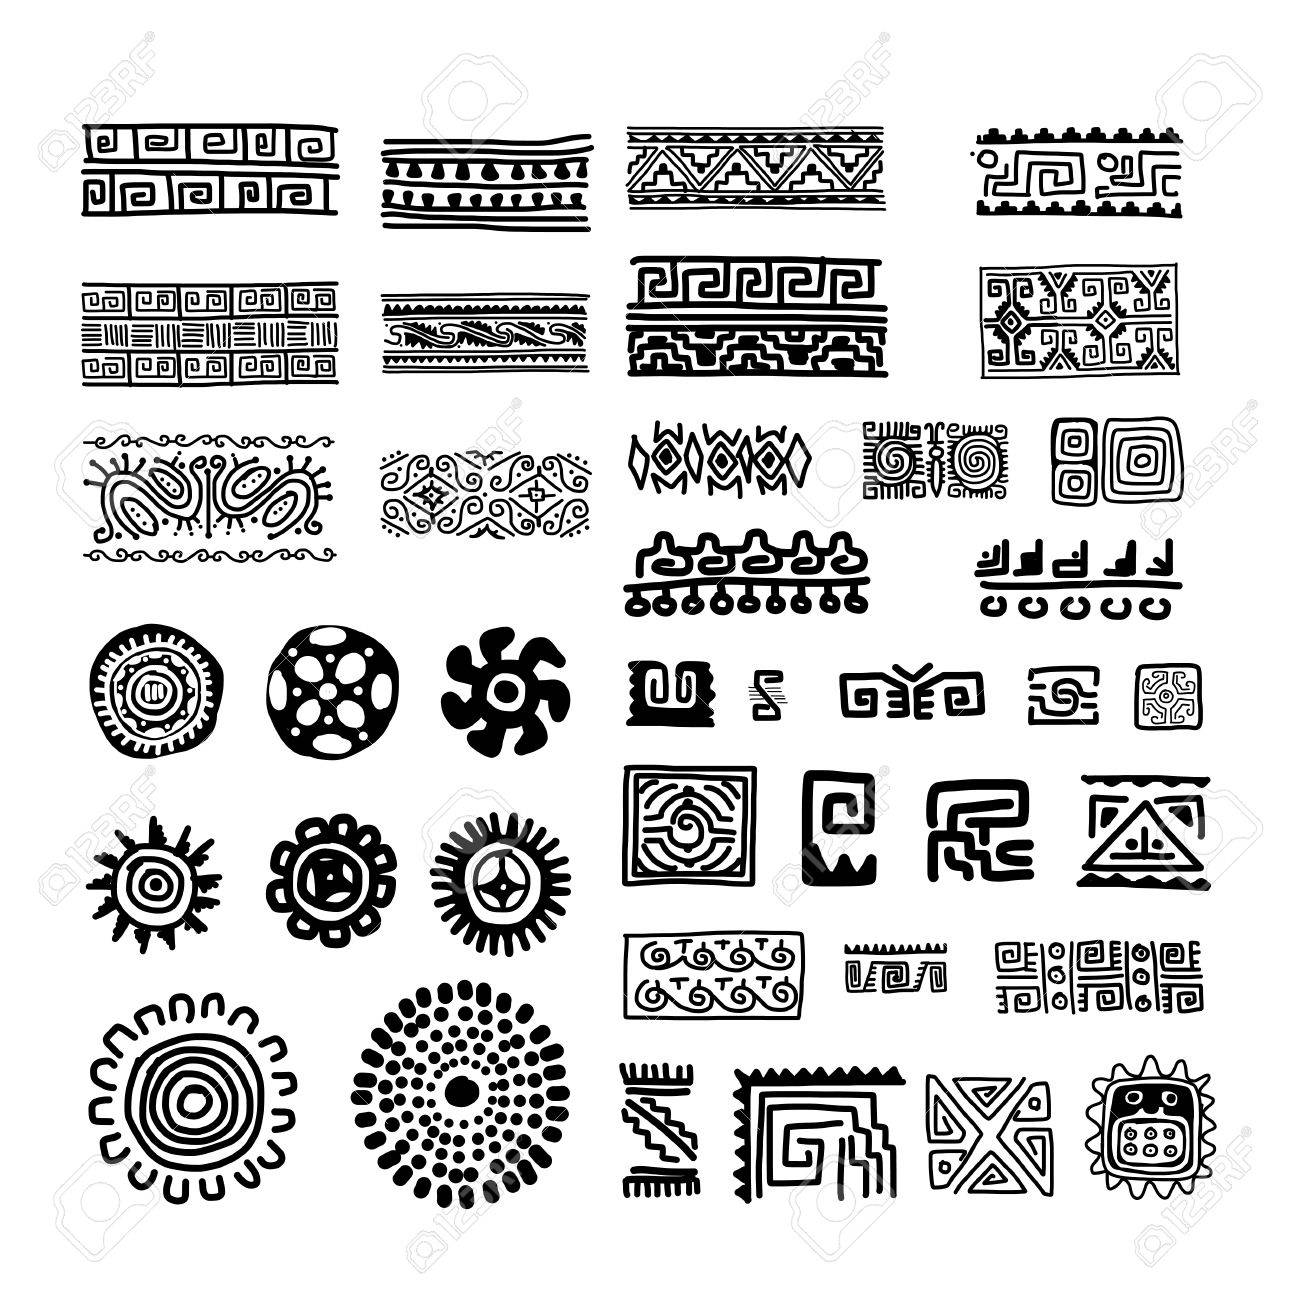 Ethnic handmade ornament for your design Stock Vector - 29253641